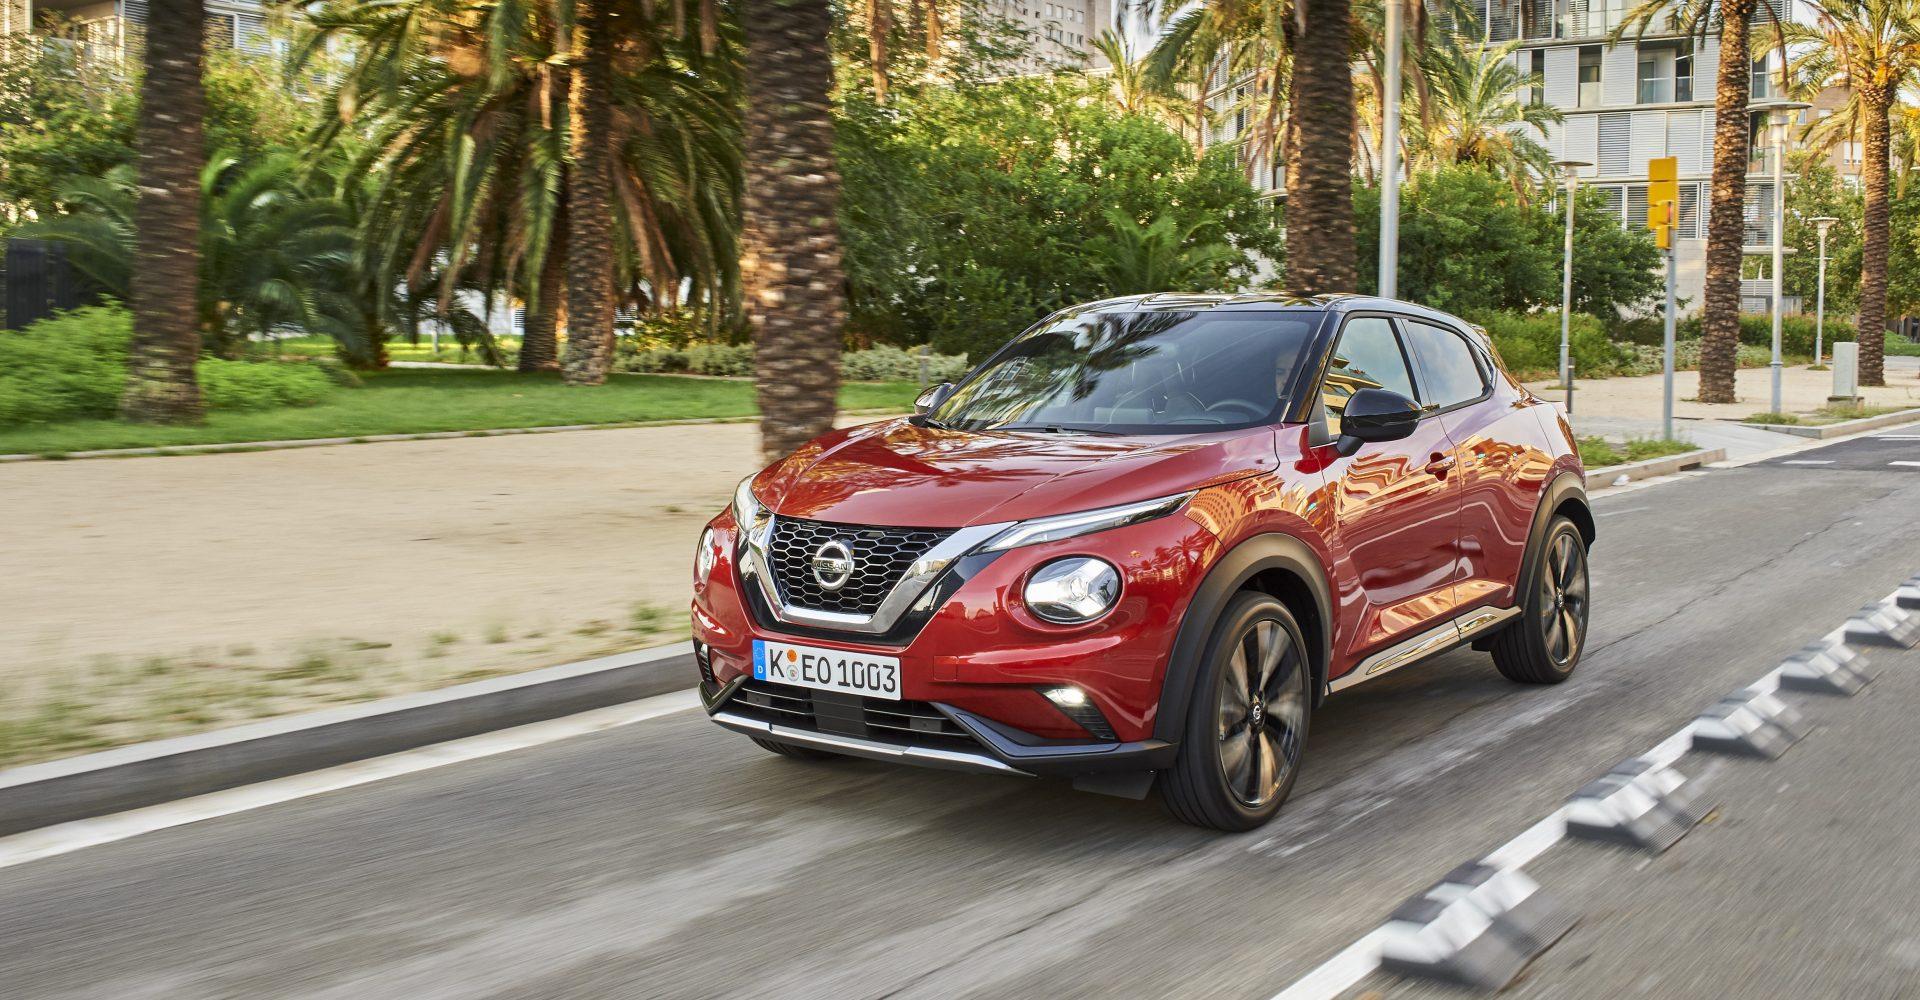 First Drive: Nissan's Juke makes a stellar comeback